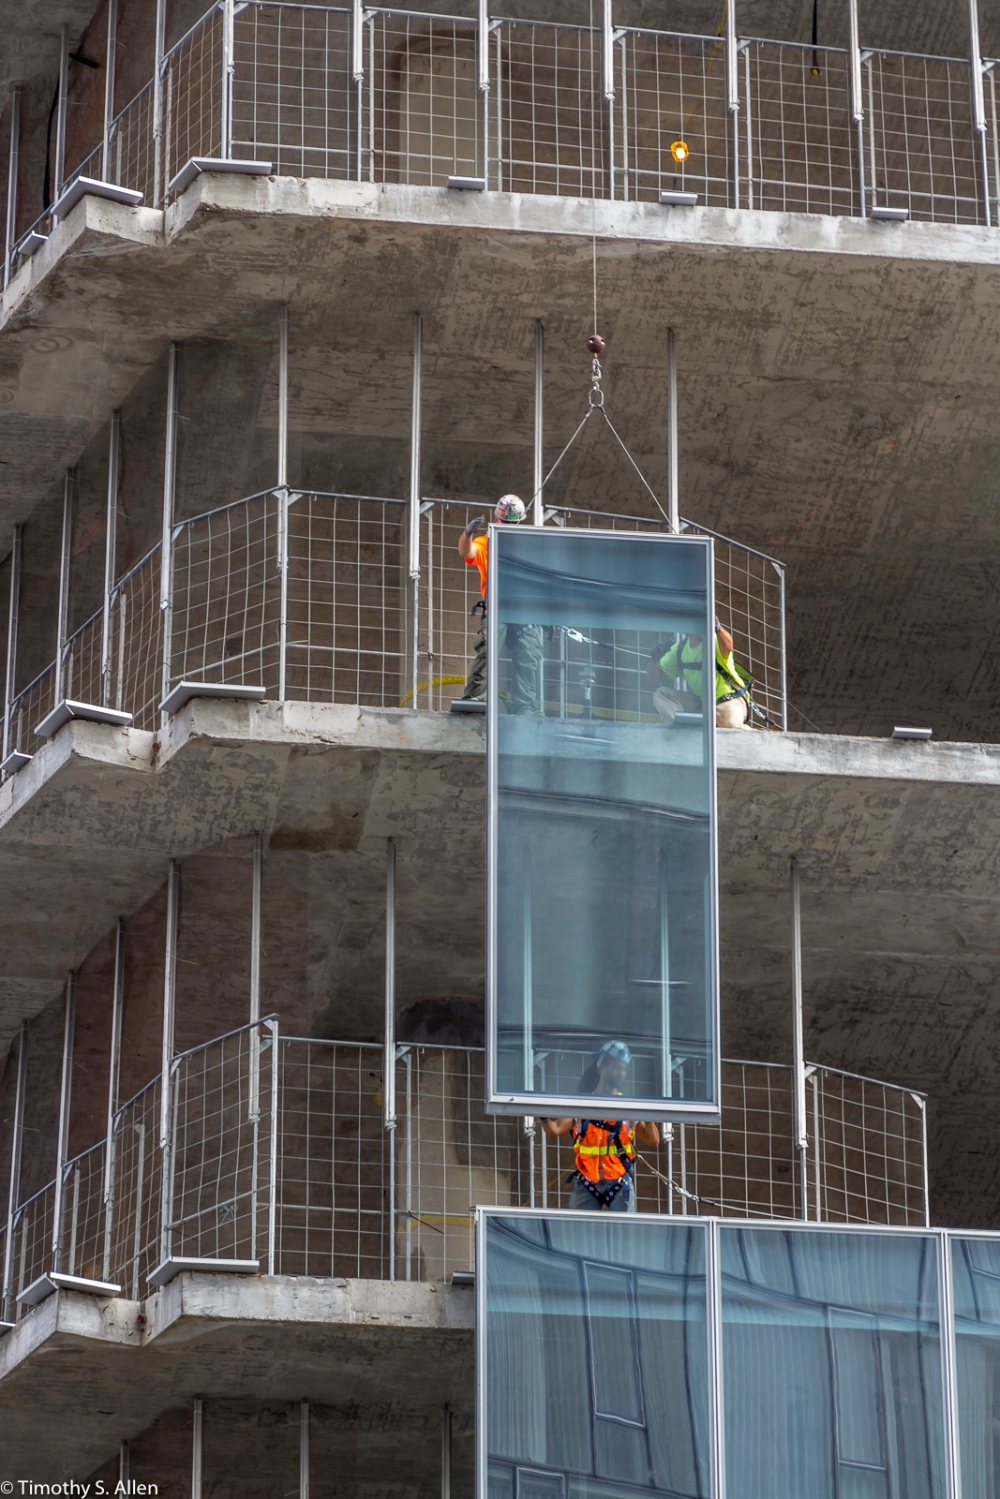 Installing Windows on a Skyscraper Being Built Near the Hudson River. New York, NY September 4, 2015